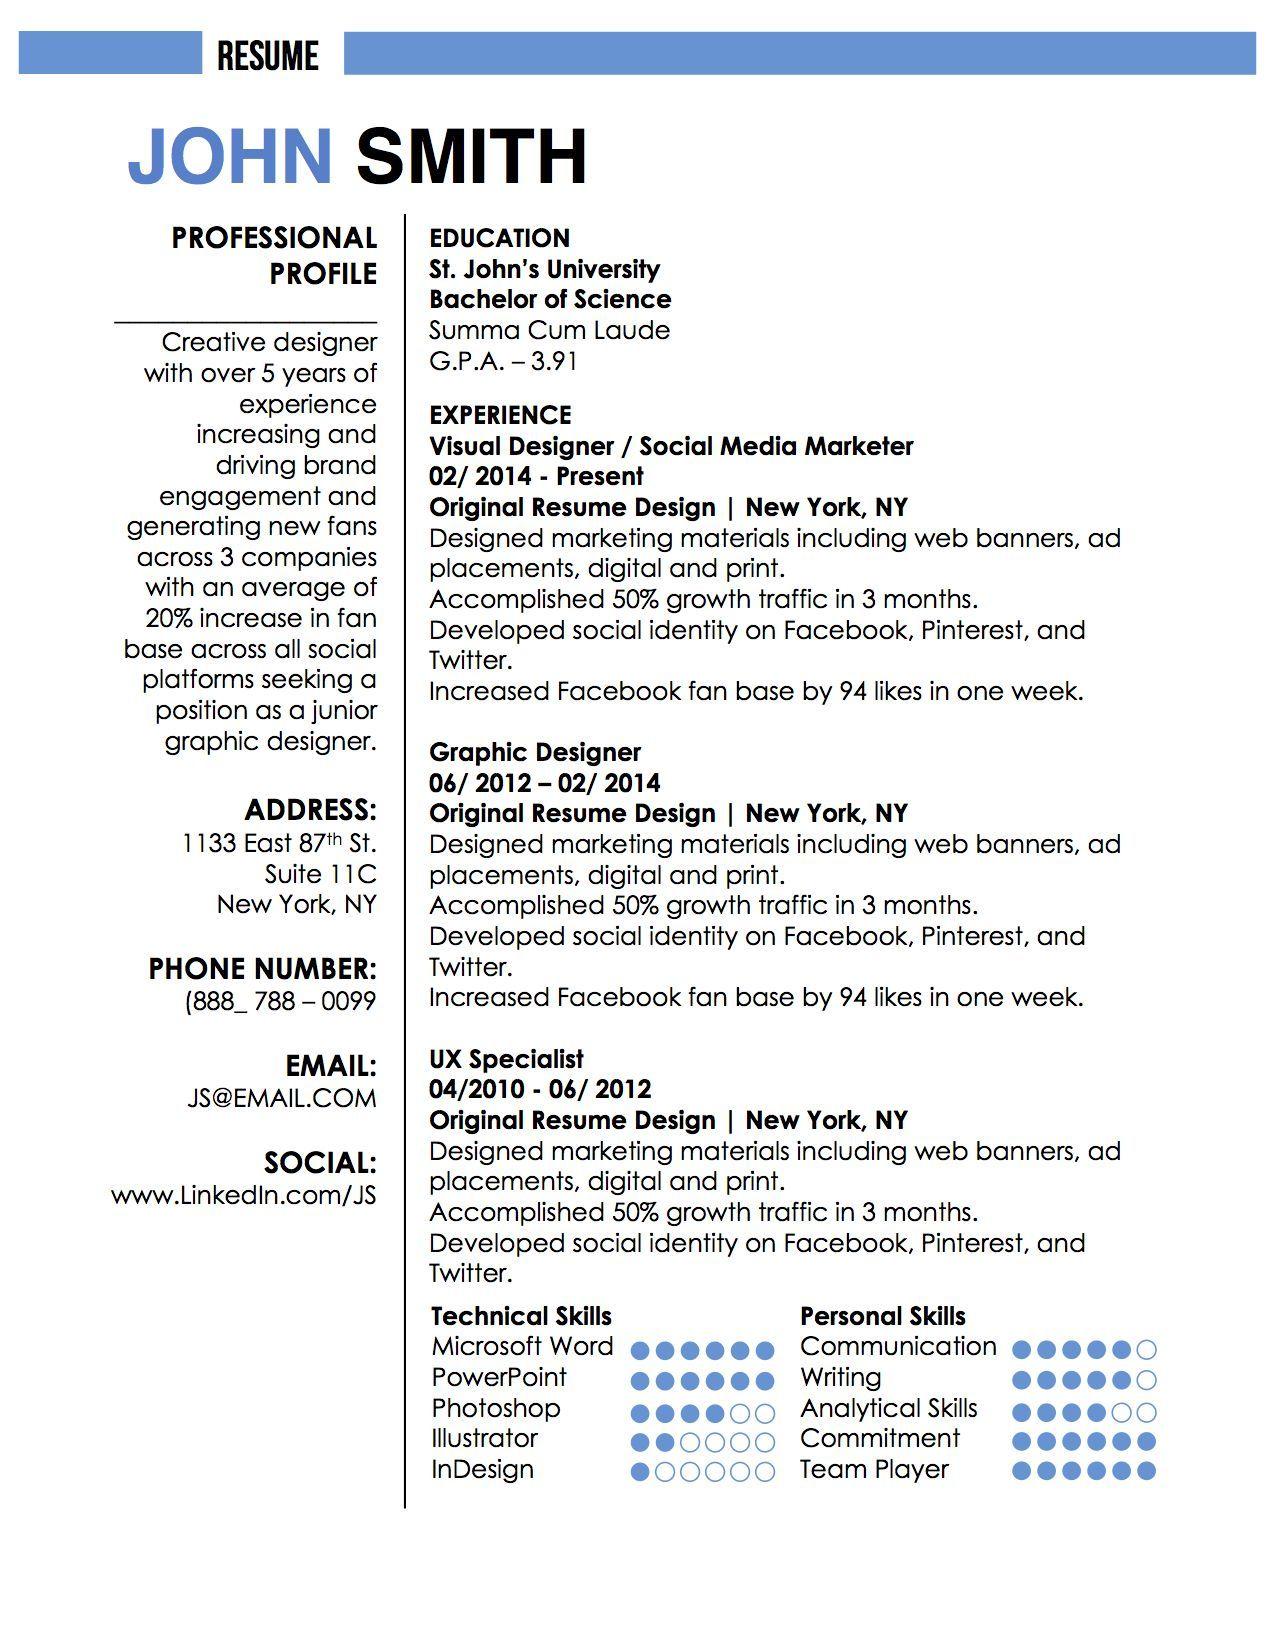 John Smith Resume Template Job Resume Template Resume Template Word Resume